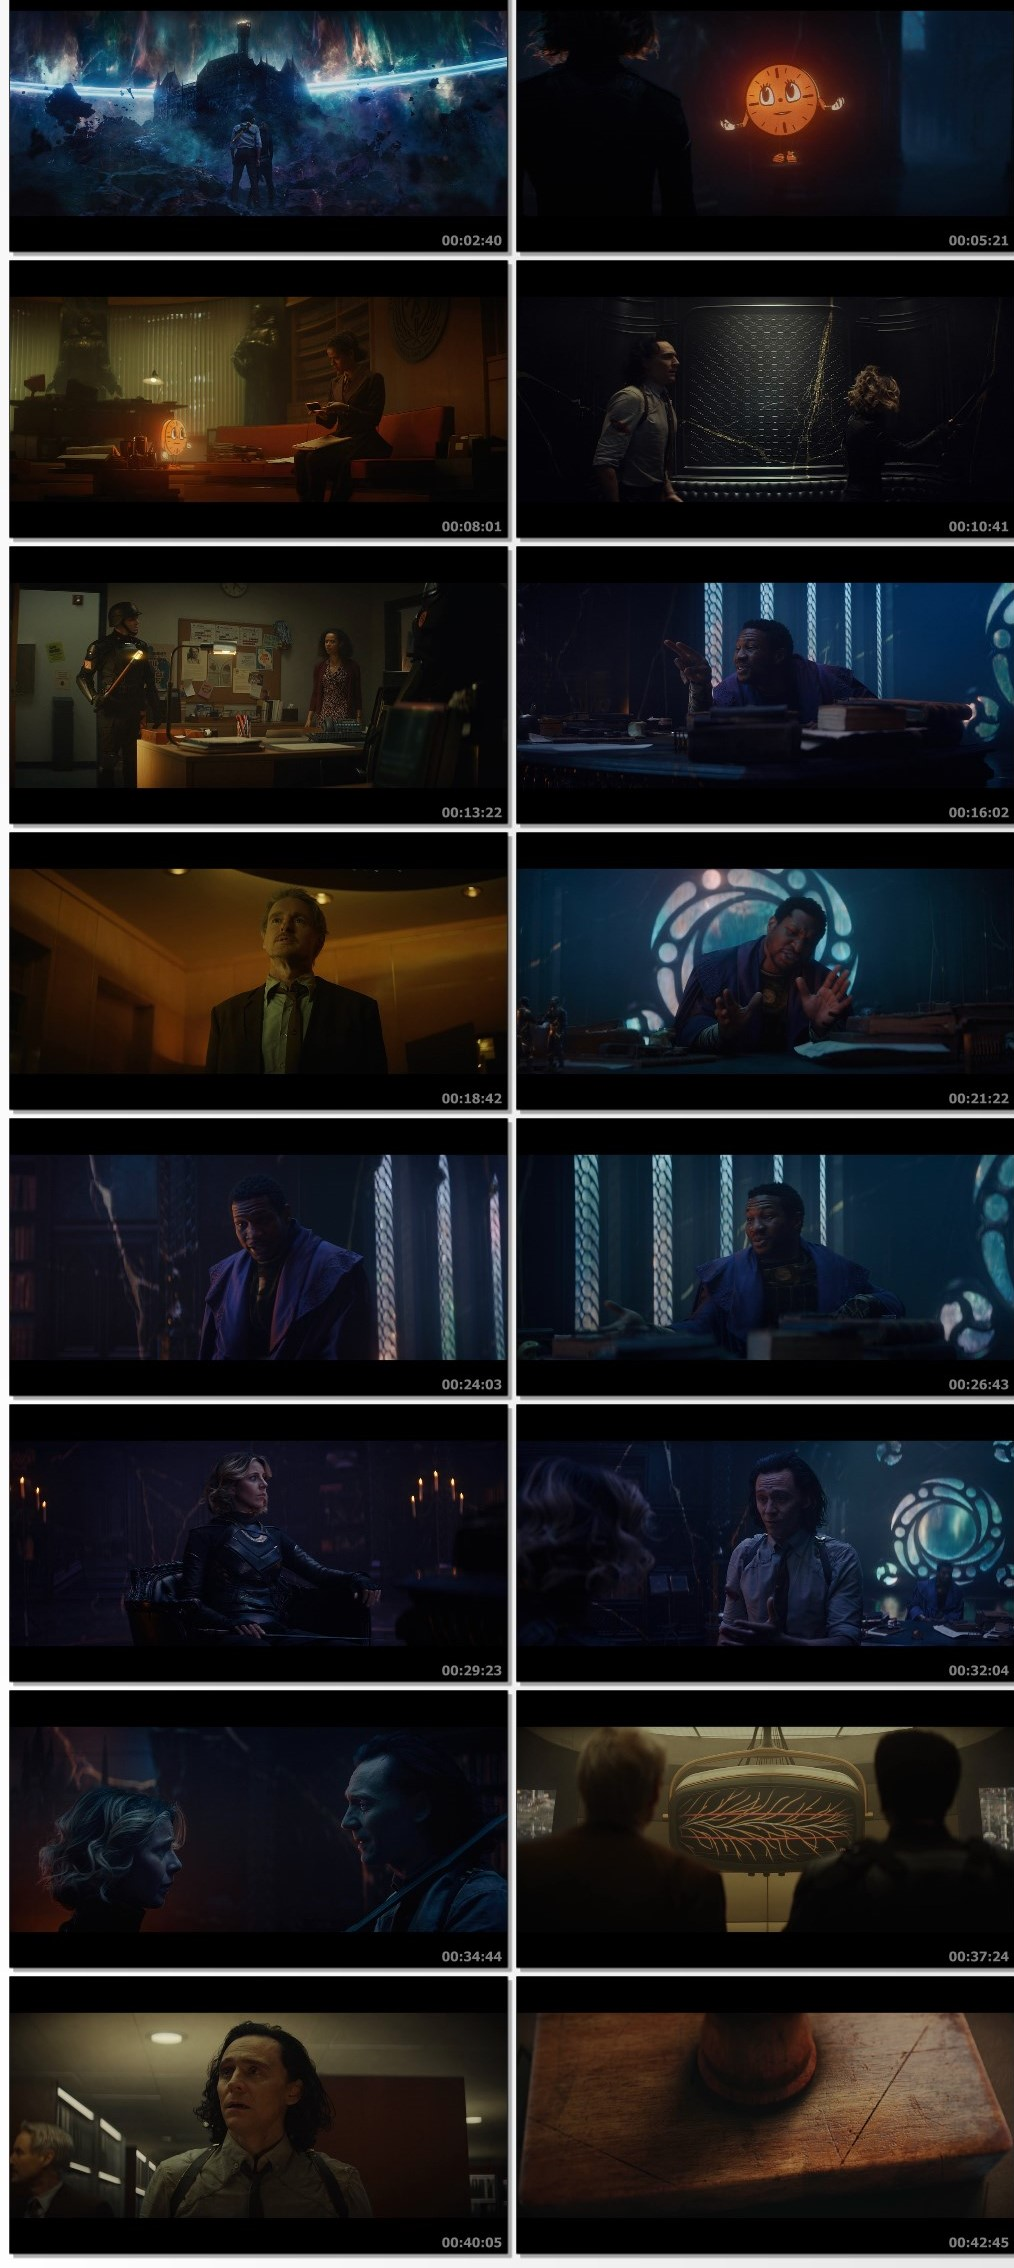 Loki-2021-S01-E06-Hindi-Dual-Audio-720p-HDRip-ESub-550-MB-mkv-thumbsa22cb25a178375a5